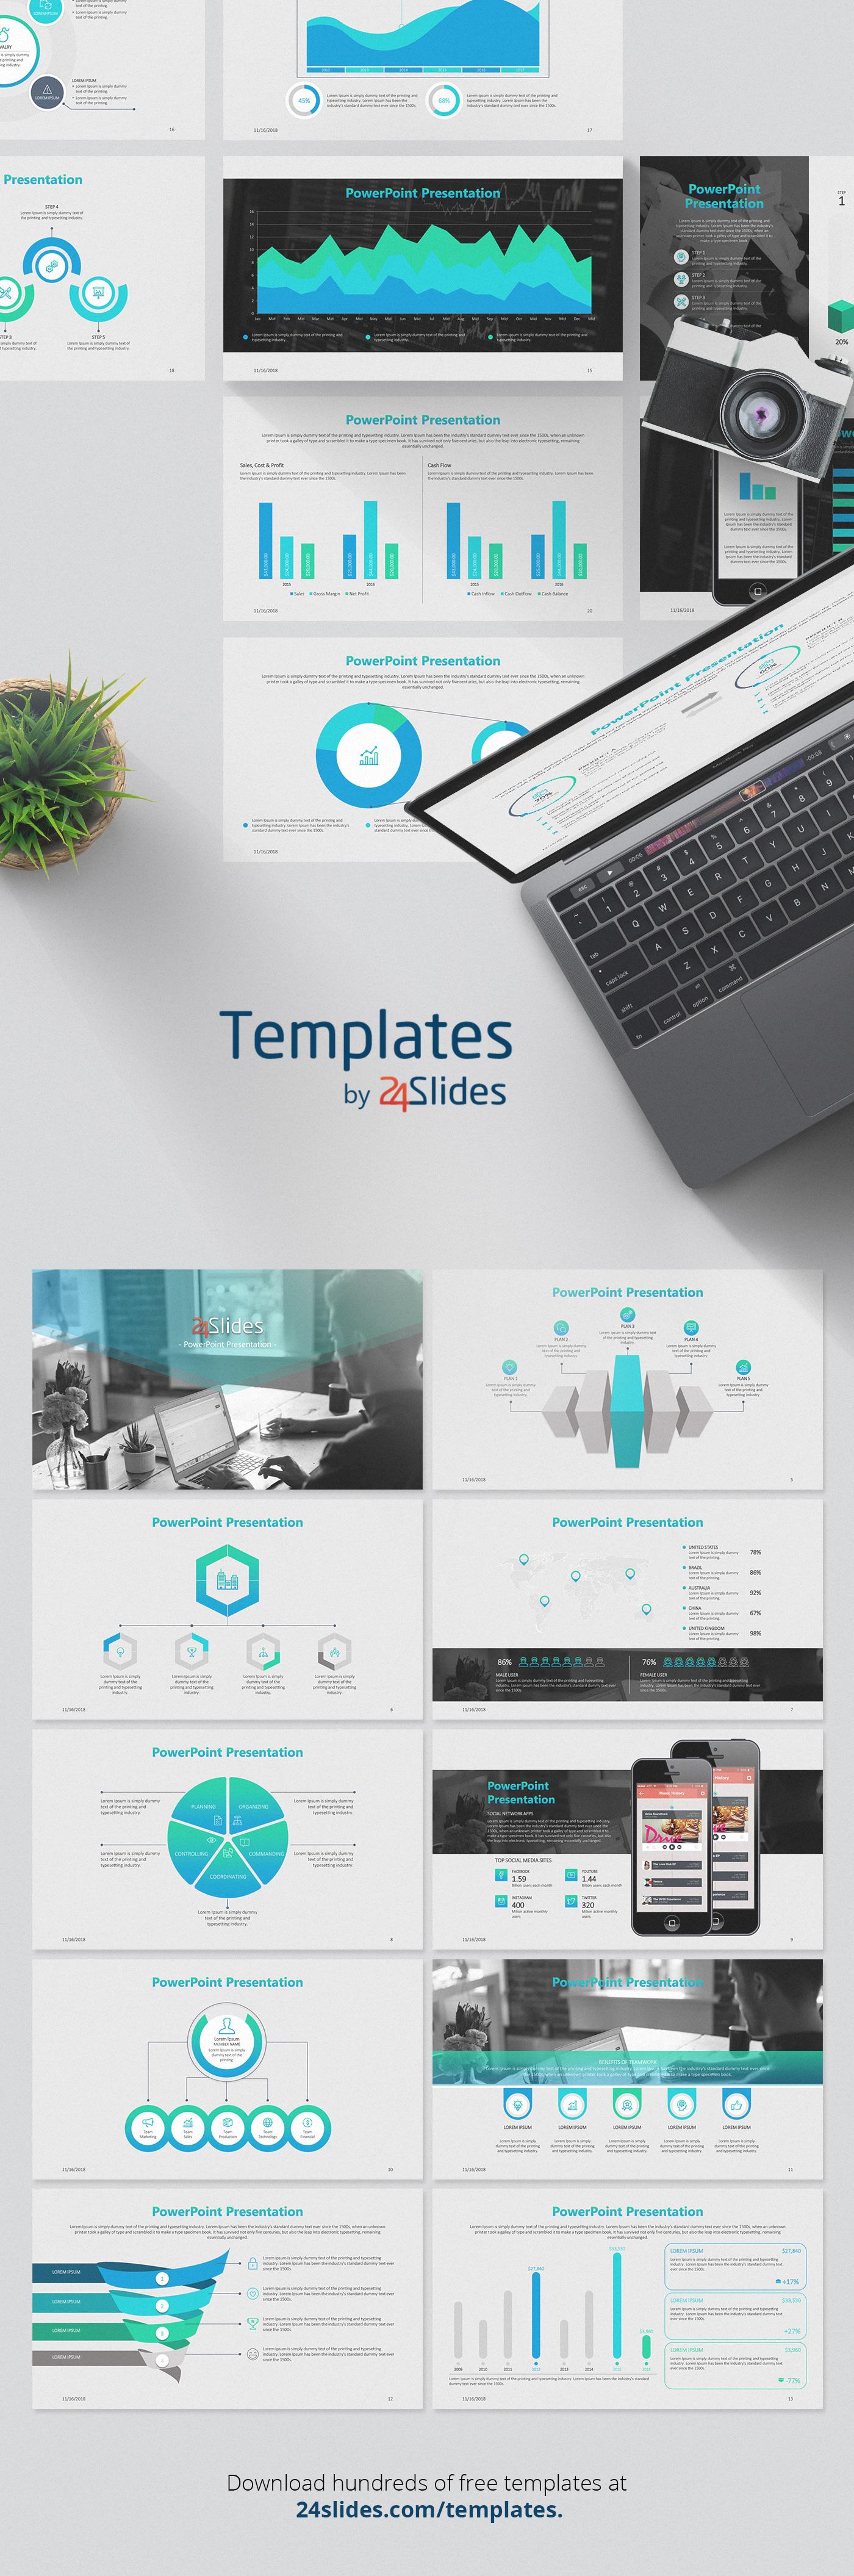 Business presentation download Powerpoint presentation corporate branding